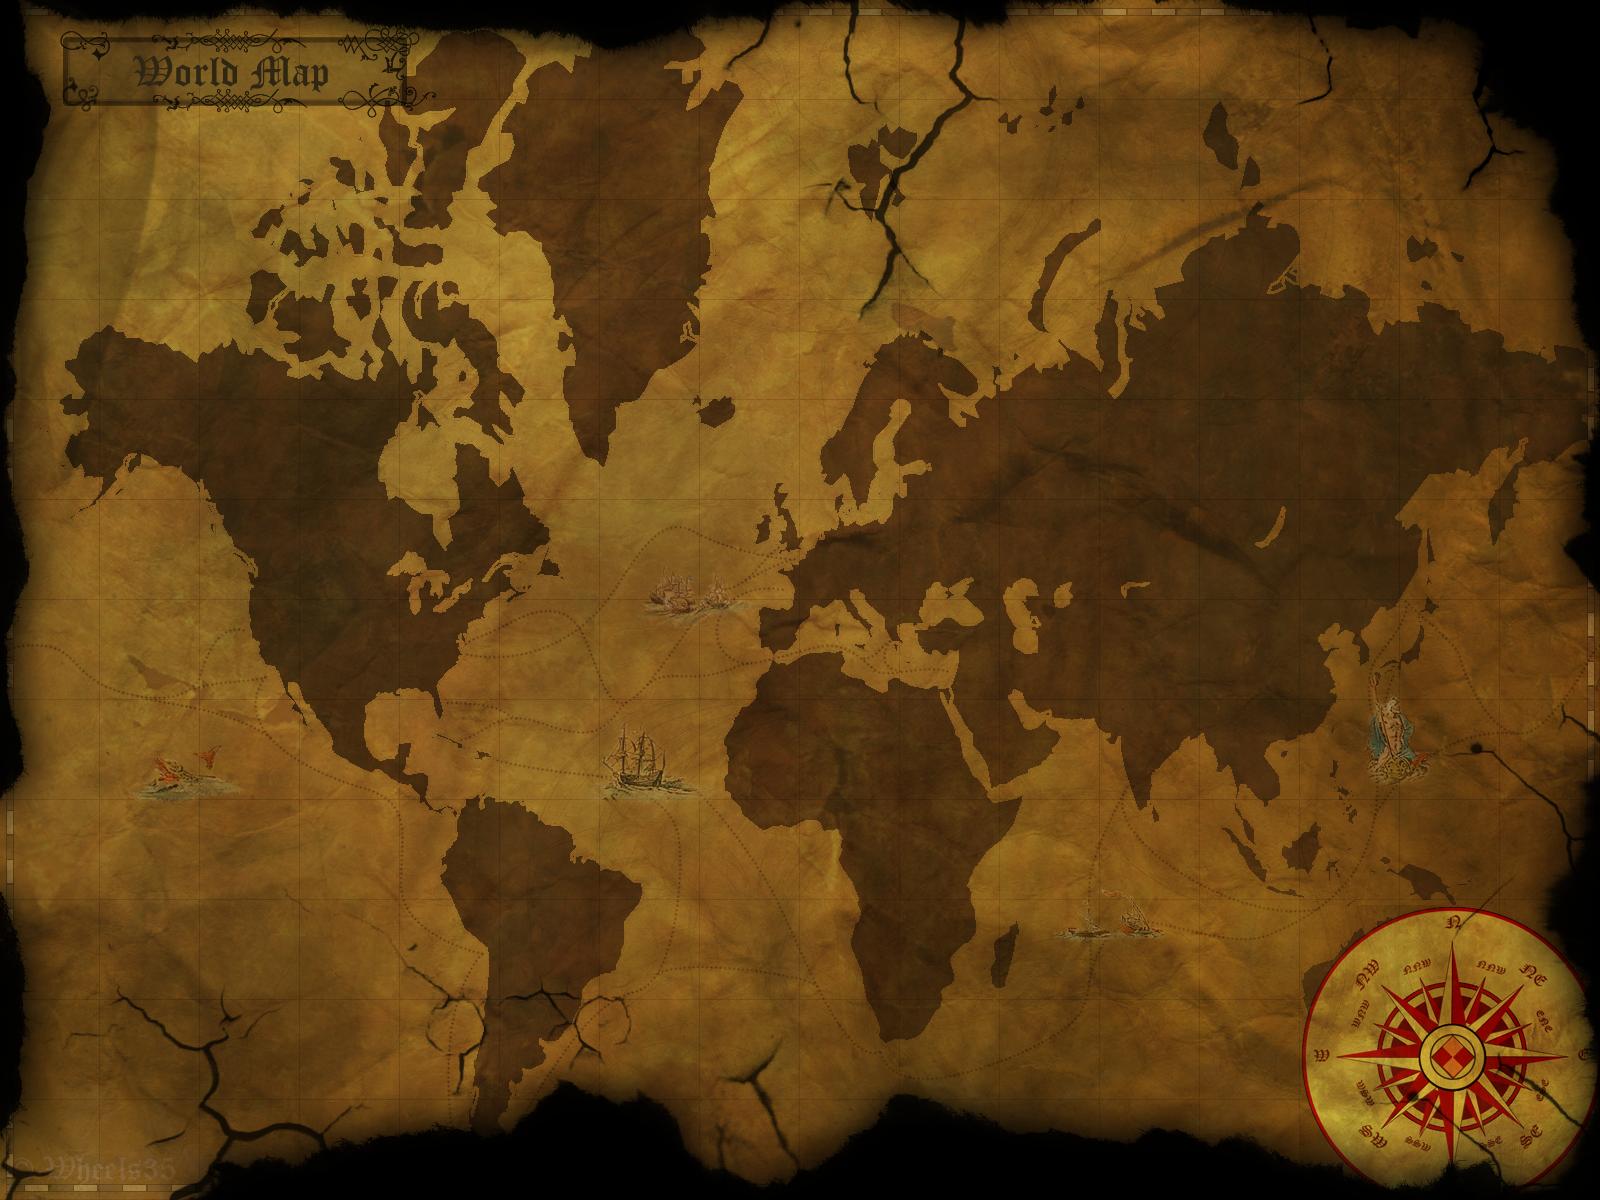 Old world map wallpaper wallpapersafari old world map wallpaper httpwwwpic2flycomoldworldmapwallpaper 1600x1200 gumiabroncs Image collections